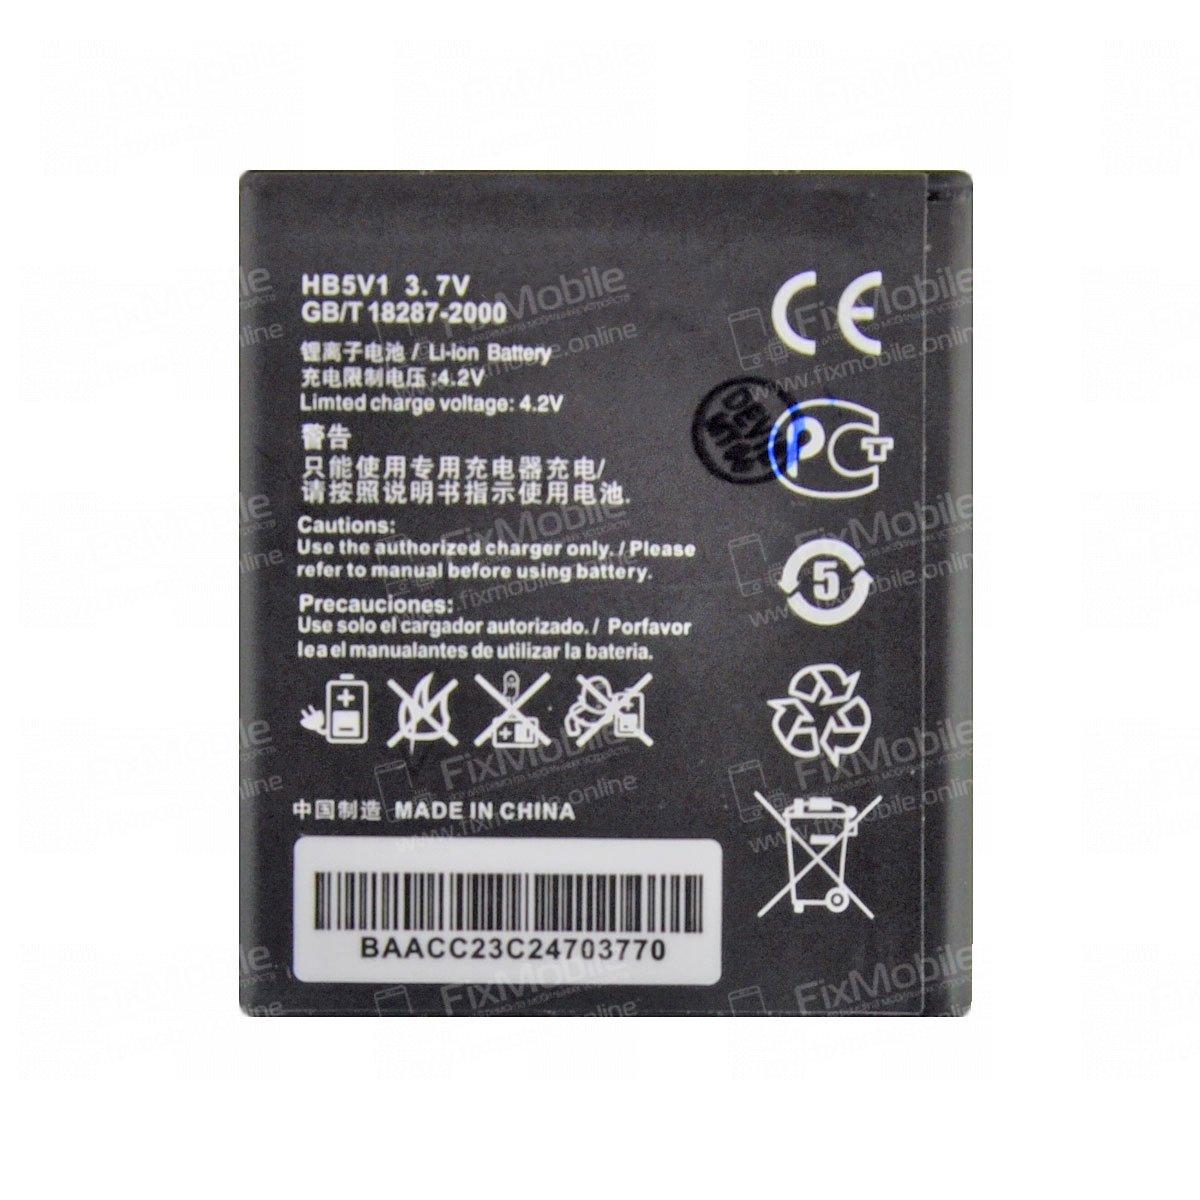 Аккумуляторная батарея для Huawei Ascend G350 HB5V1